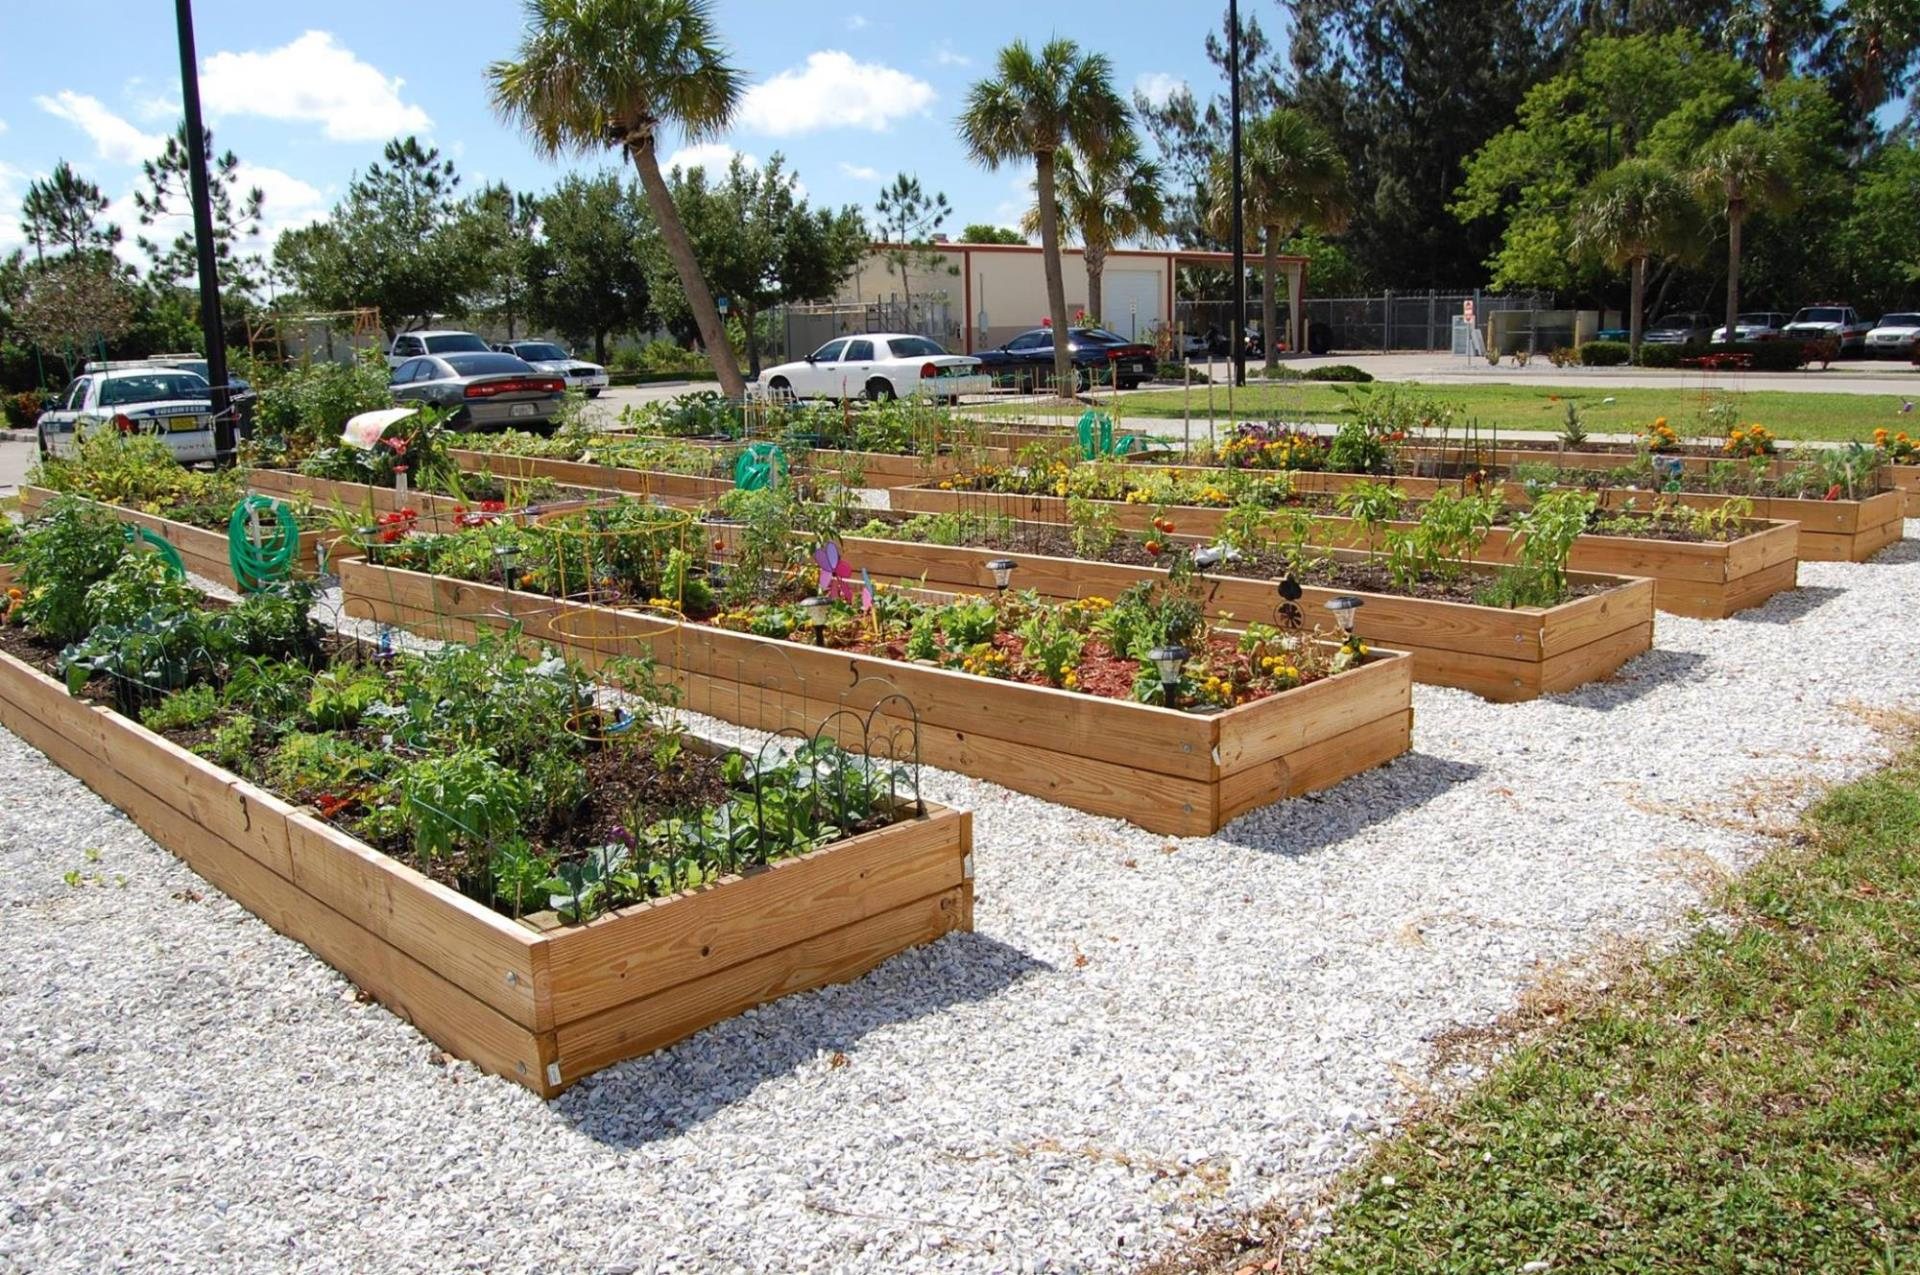 Public Safety Community Garden | City Park Rental Fees | City of ...